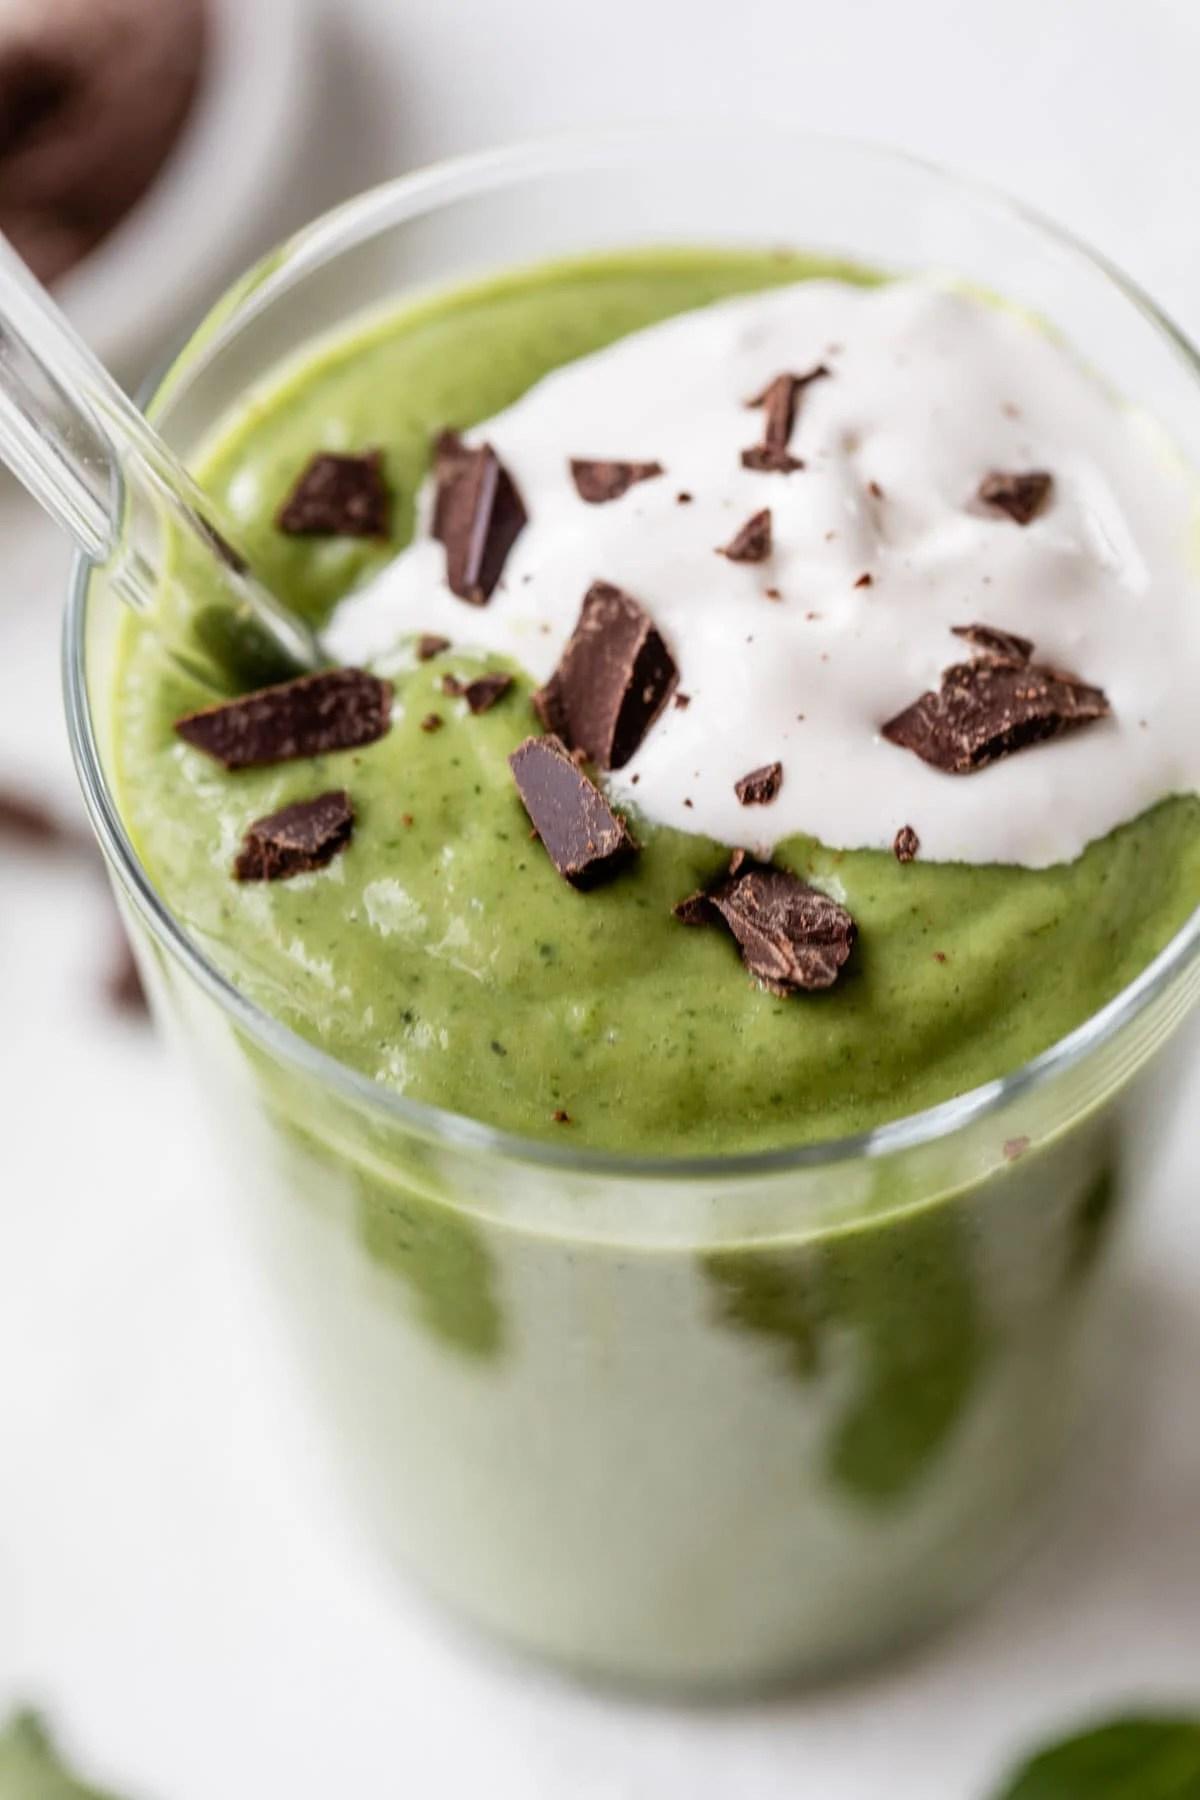 healthy homemade Shamrock Shakes made with frozen bananas, avocado, and fresh mint